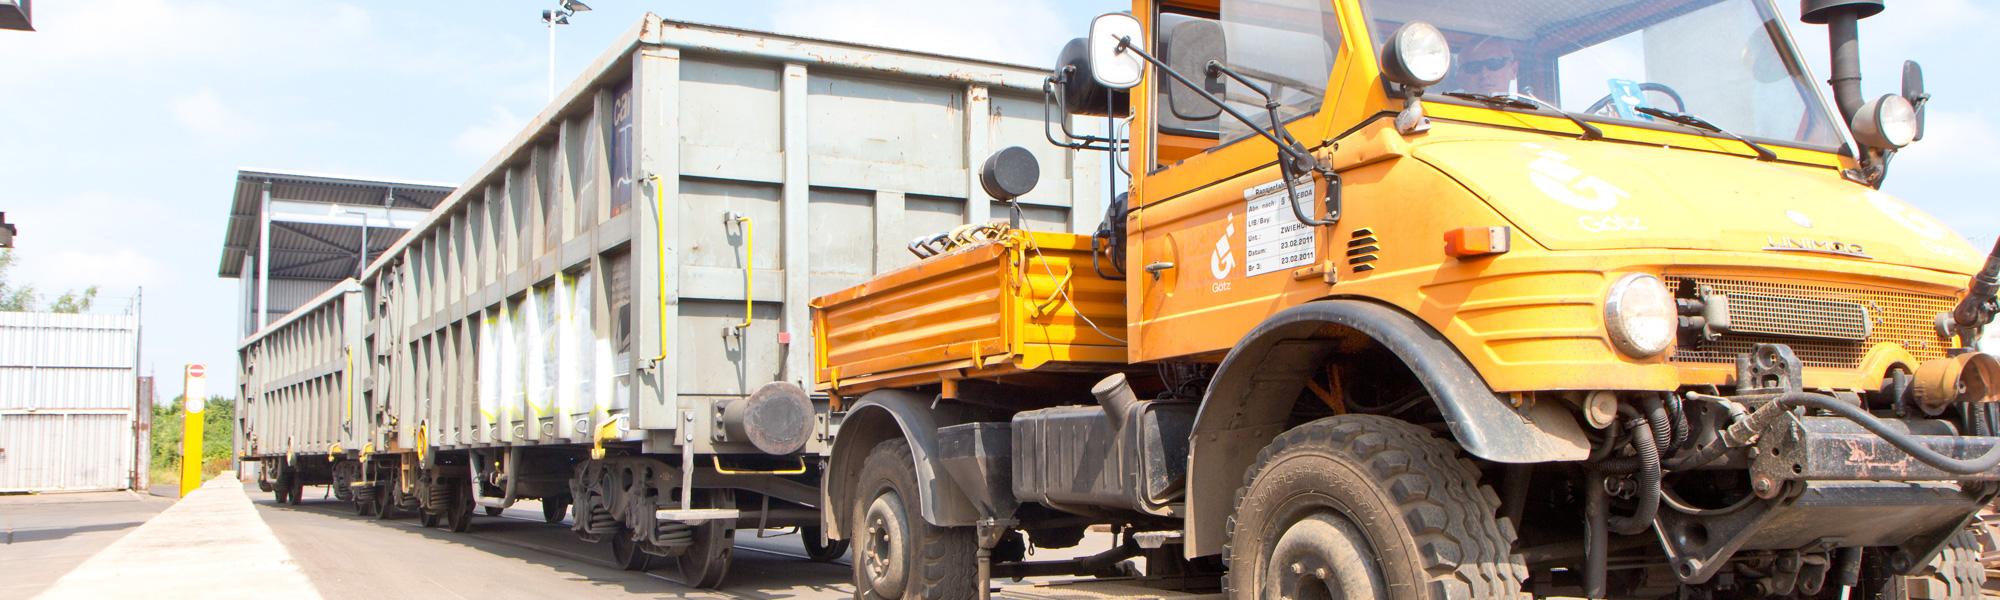 Götz GmbH Logistik Unimog